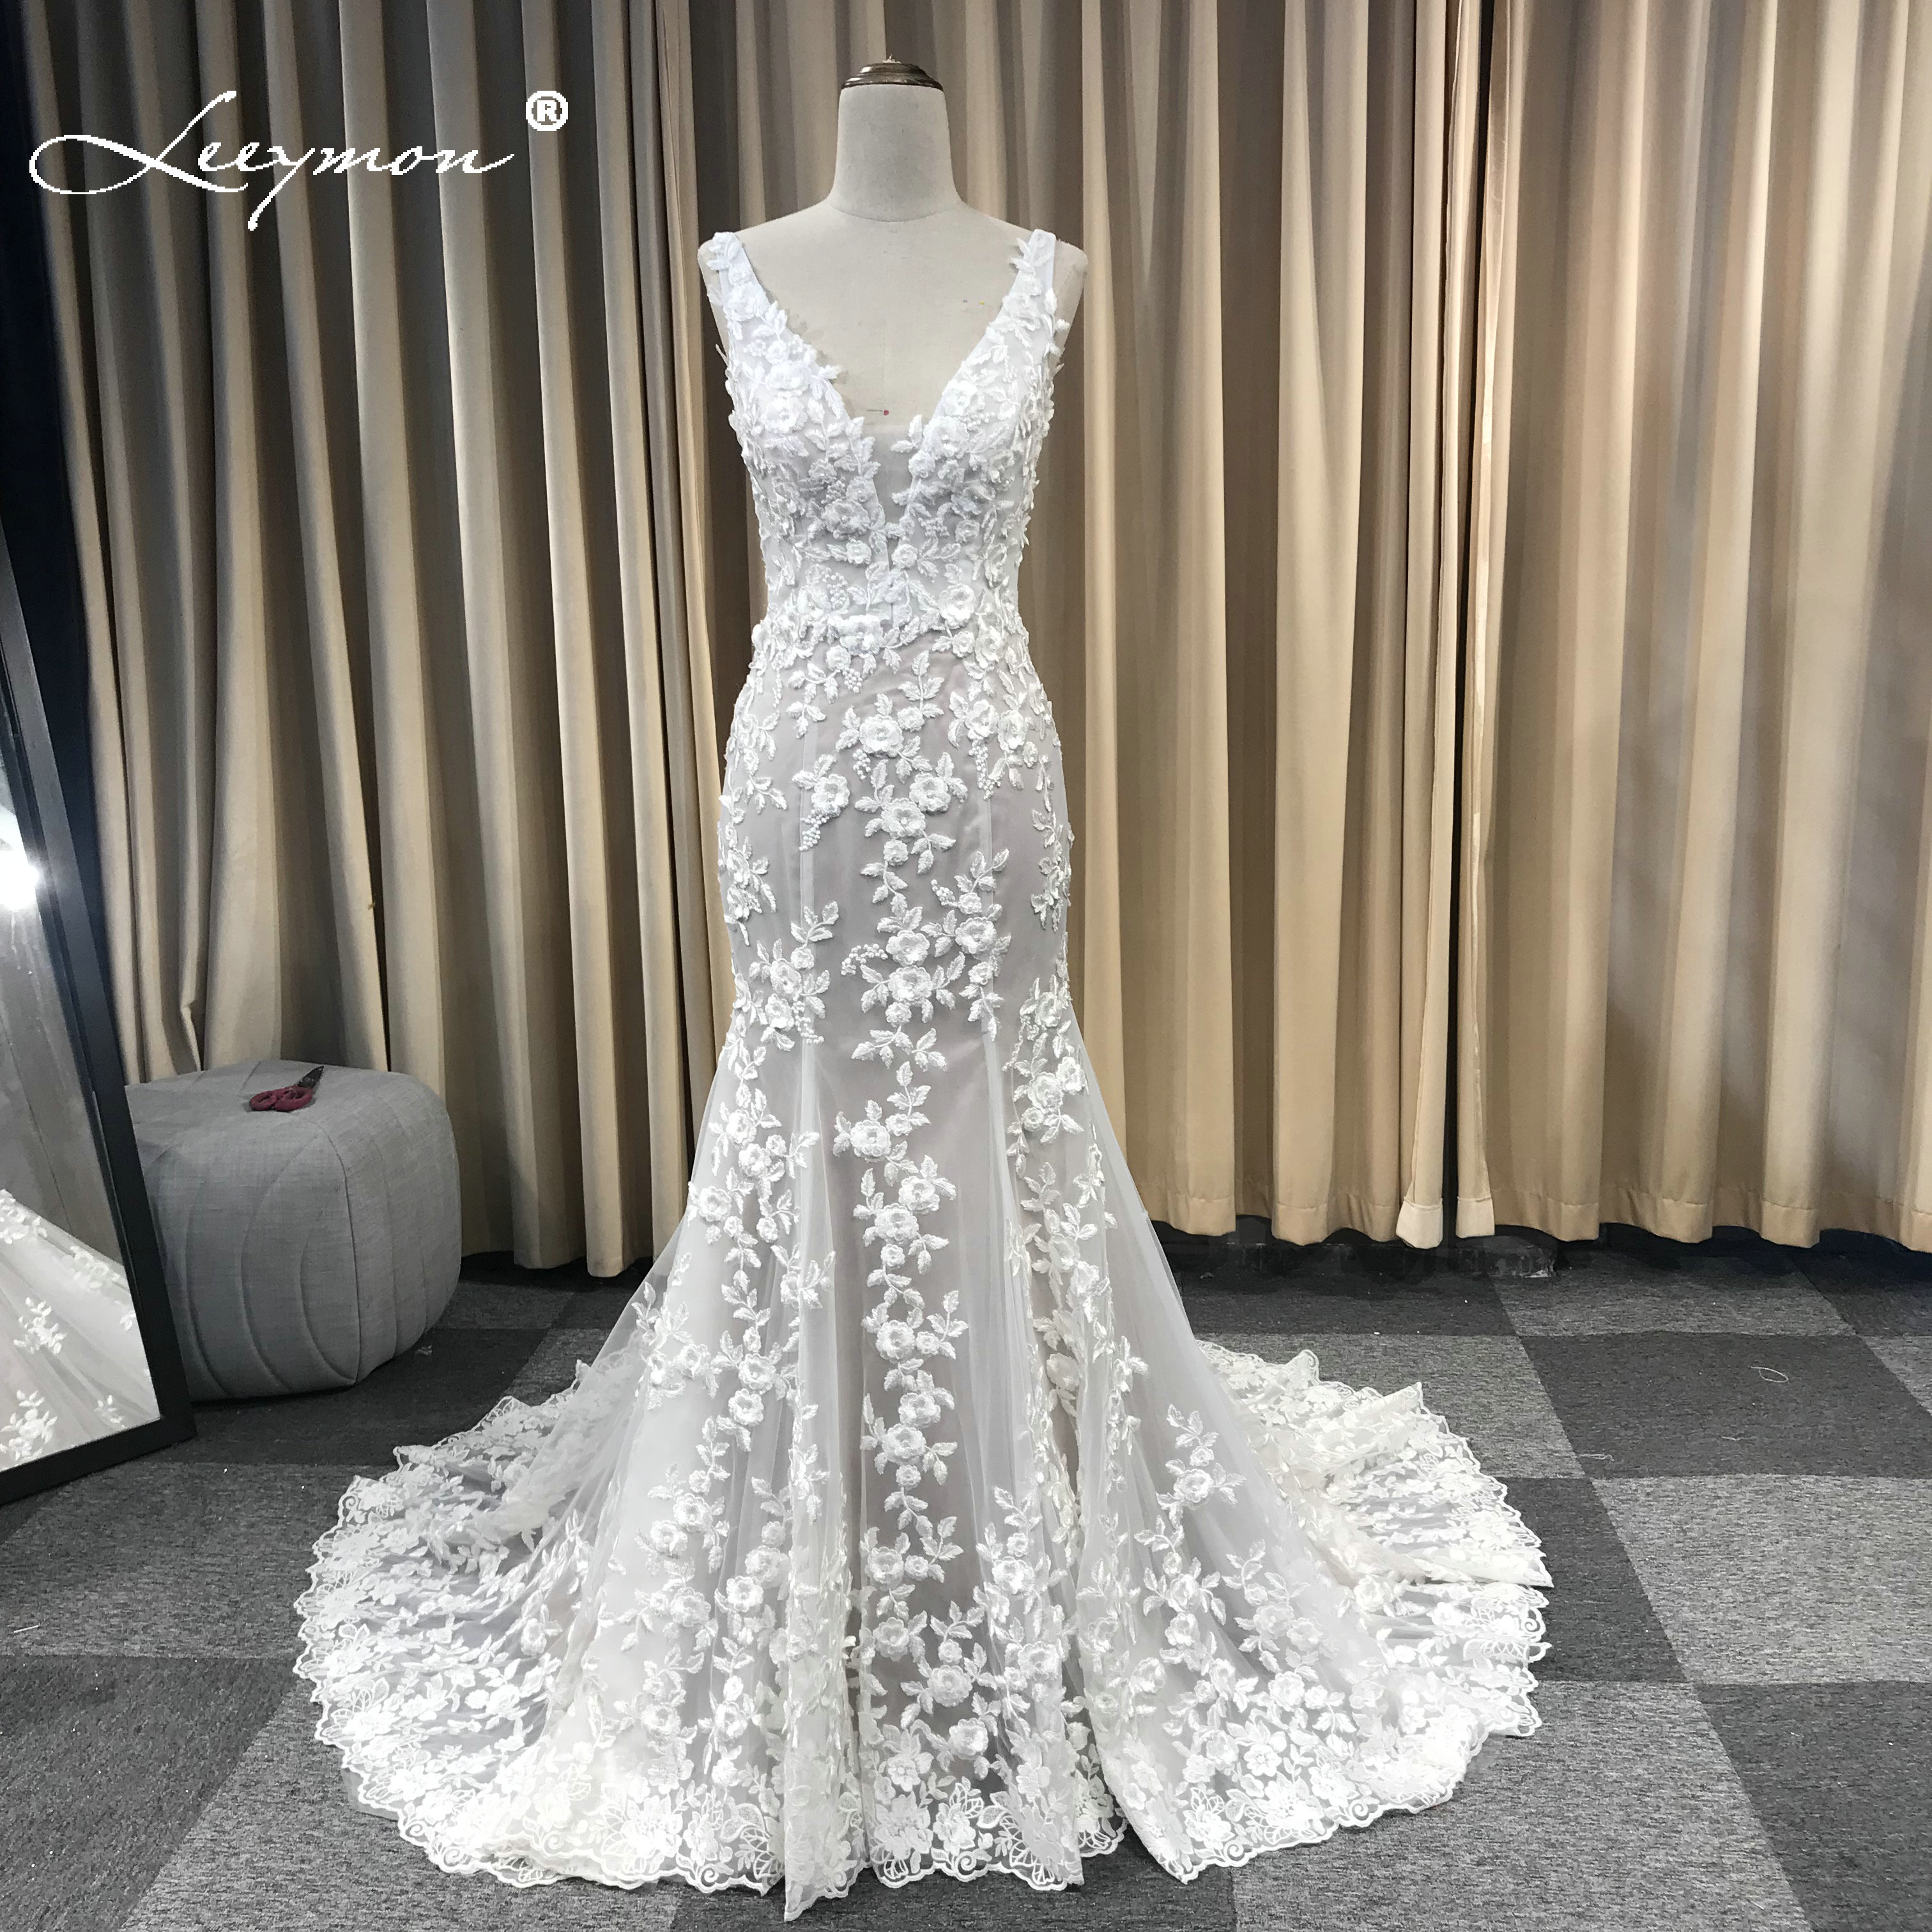 Leeymon حورية البحر العاج الرباط يزين فستان الزفاف الخامس الرقبة مطرز مثير عارية الذراعين فستان زفاف رداء دي Mariee